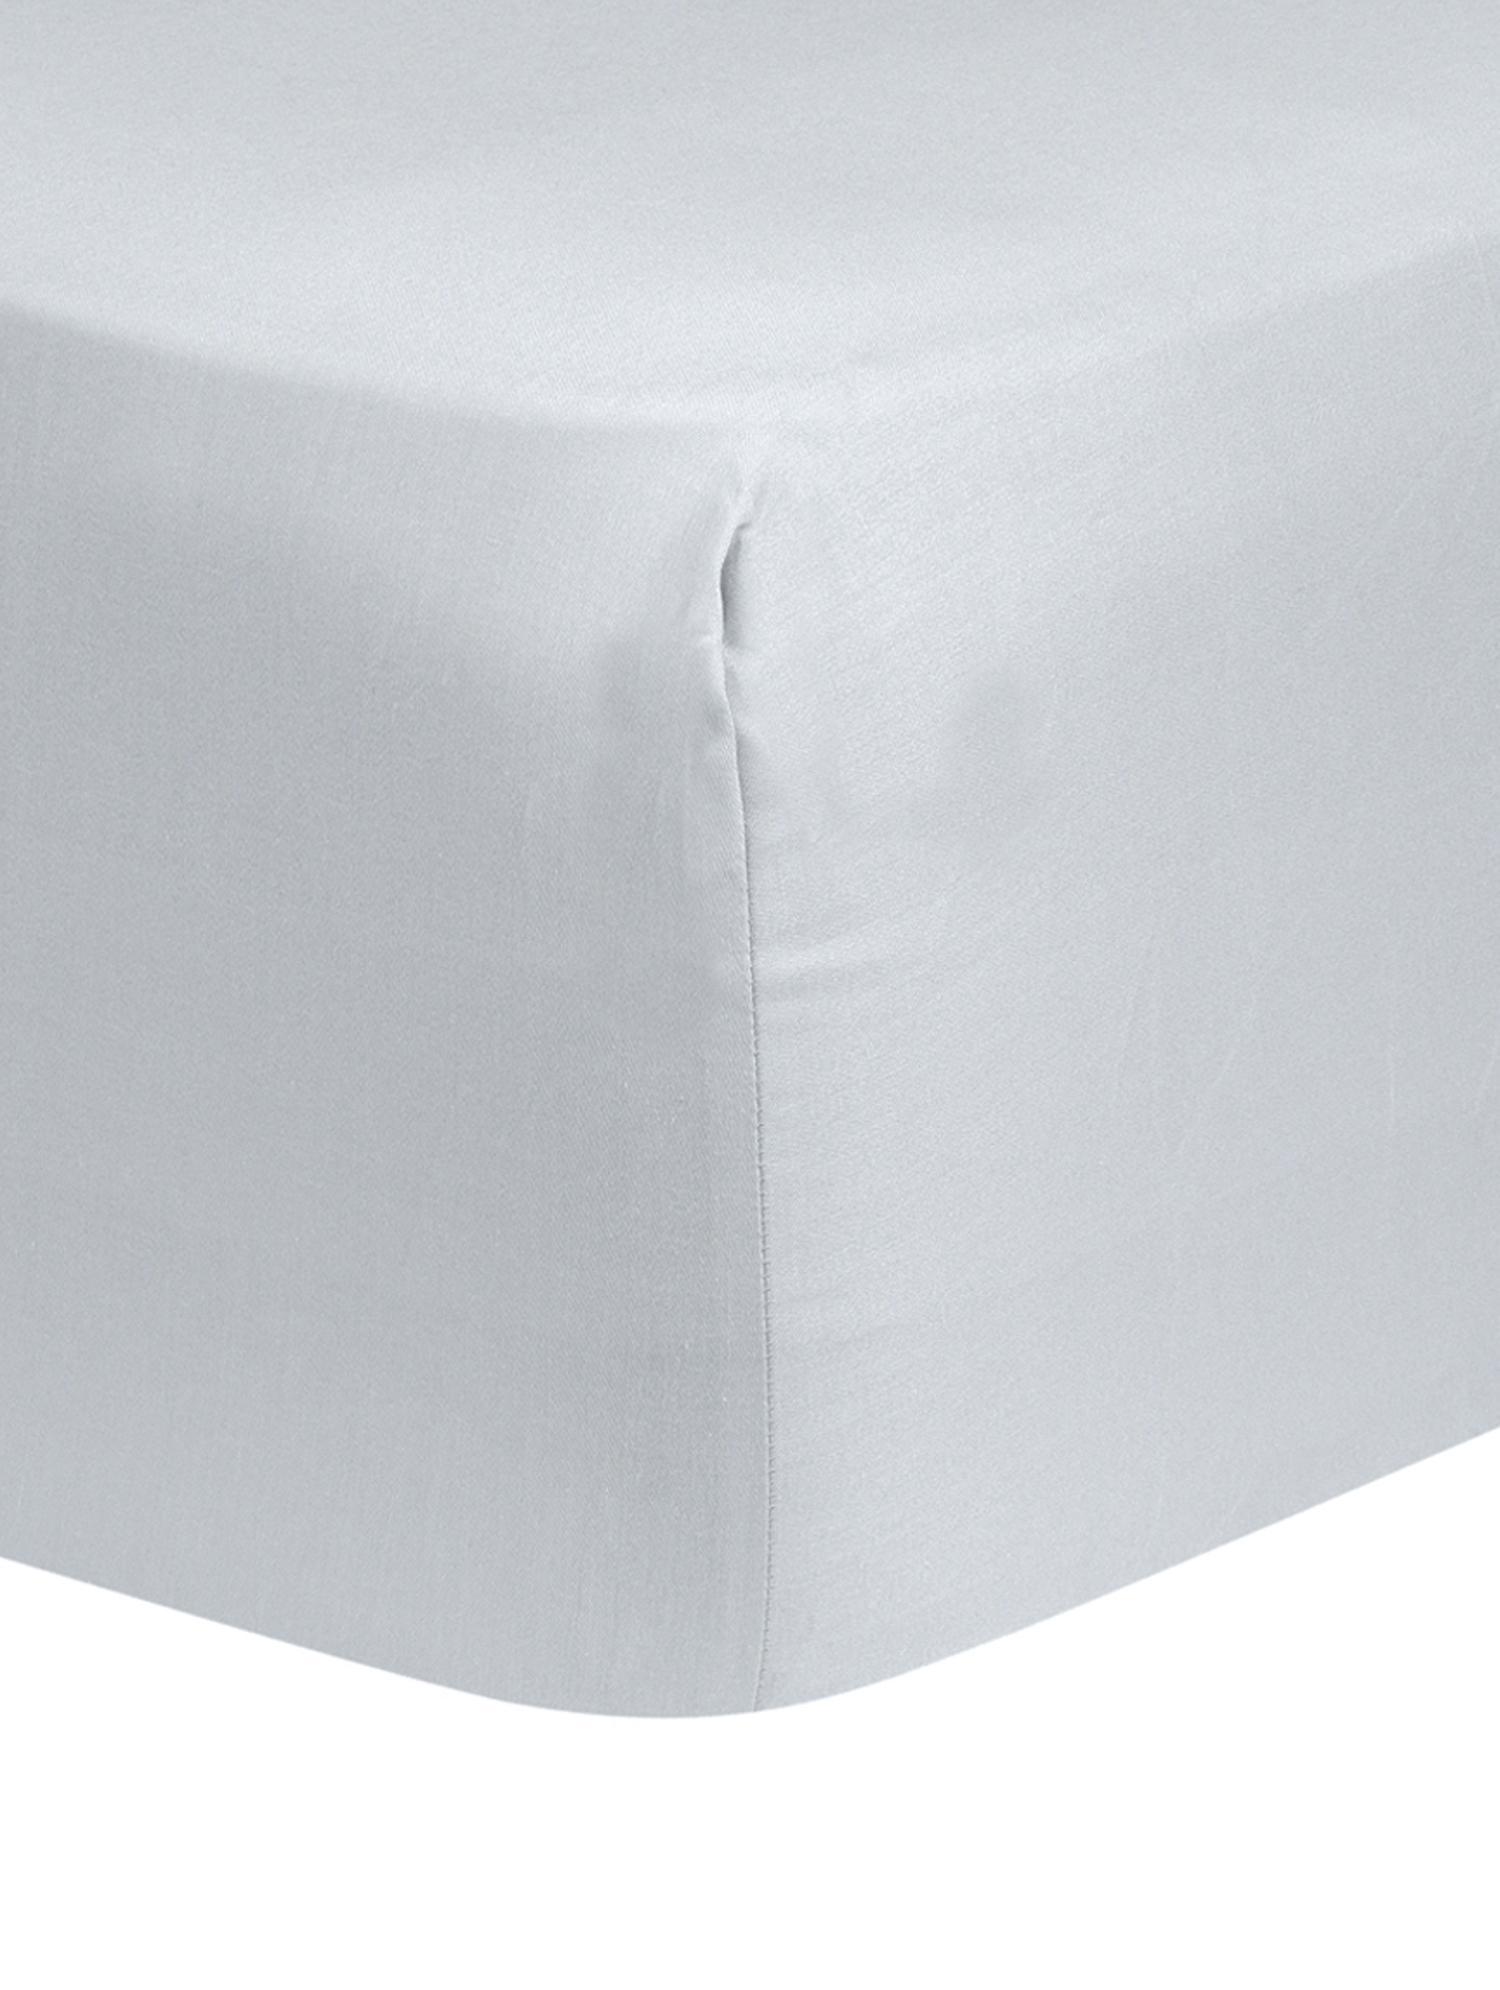 Sábana bajera para boxspring de algodón Comfort, Gris claro, Cama 135/140 cm (140 x 200 cm)